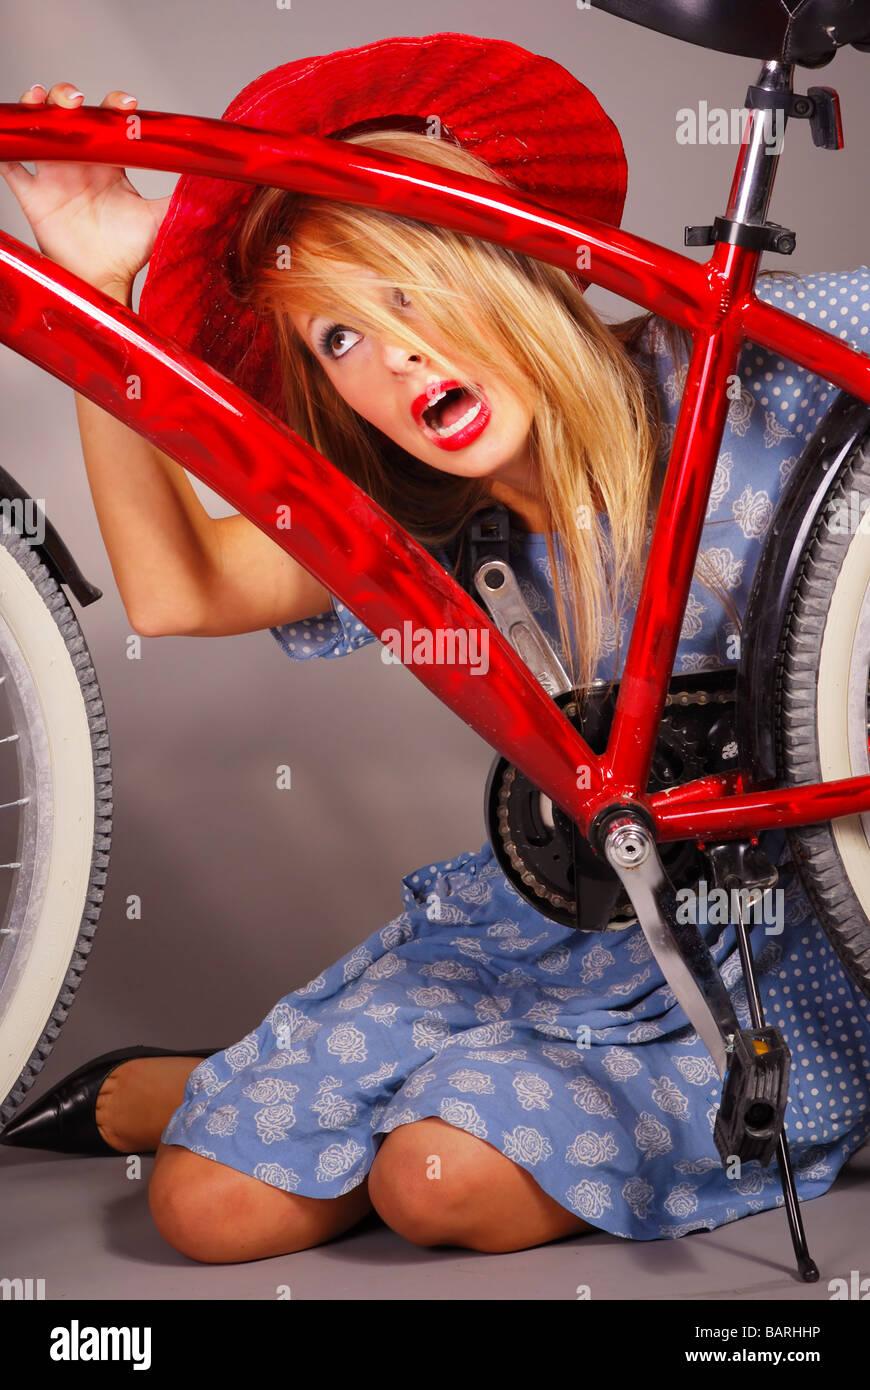 Blonde teenage girl wearing hat standing behind red bicycle Stock Photo